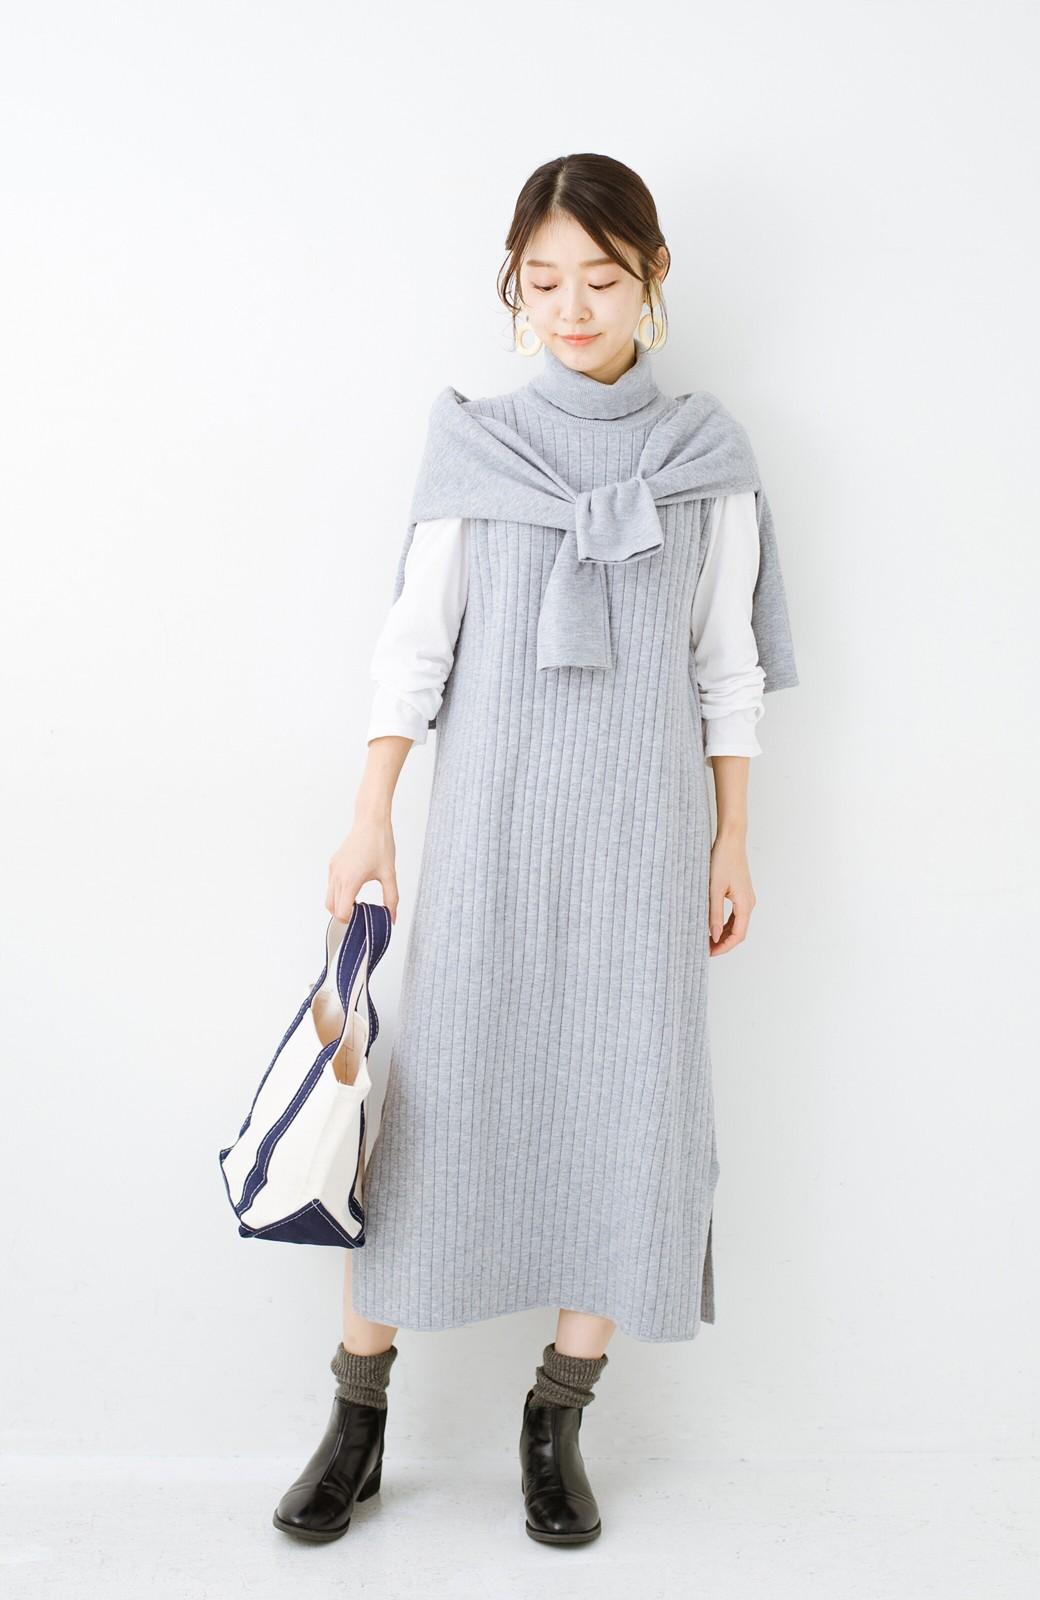 haco! セットで着るだけパッとかわいい ニットトップス&ノースリーブニットワンピースセット <グレー>の商品写真14